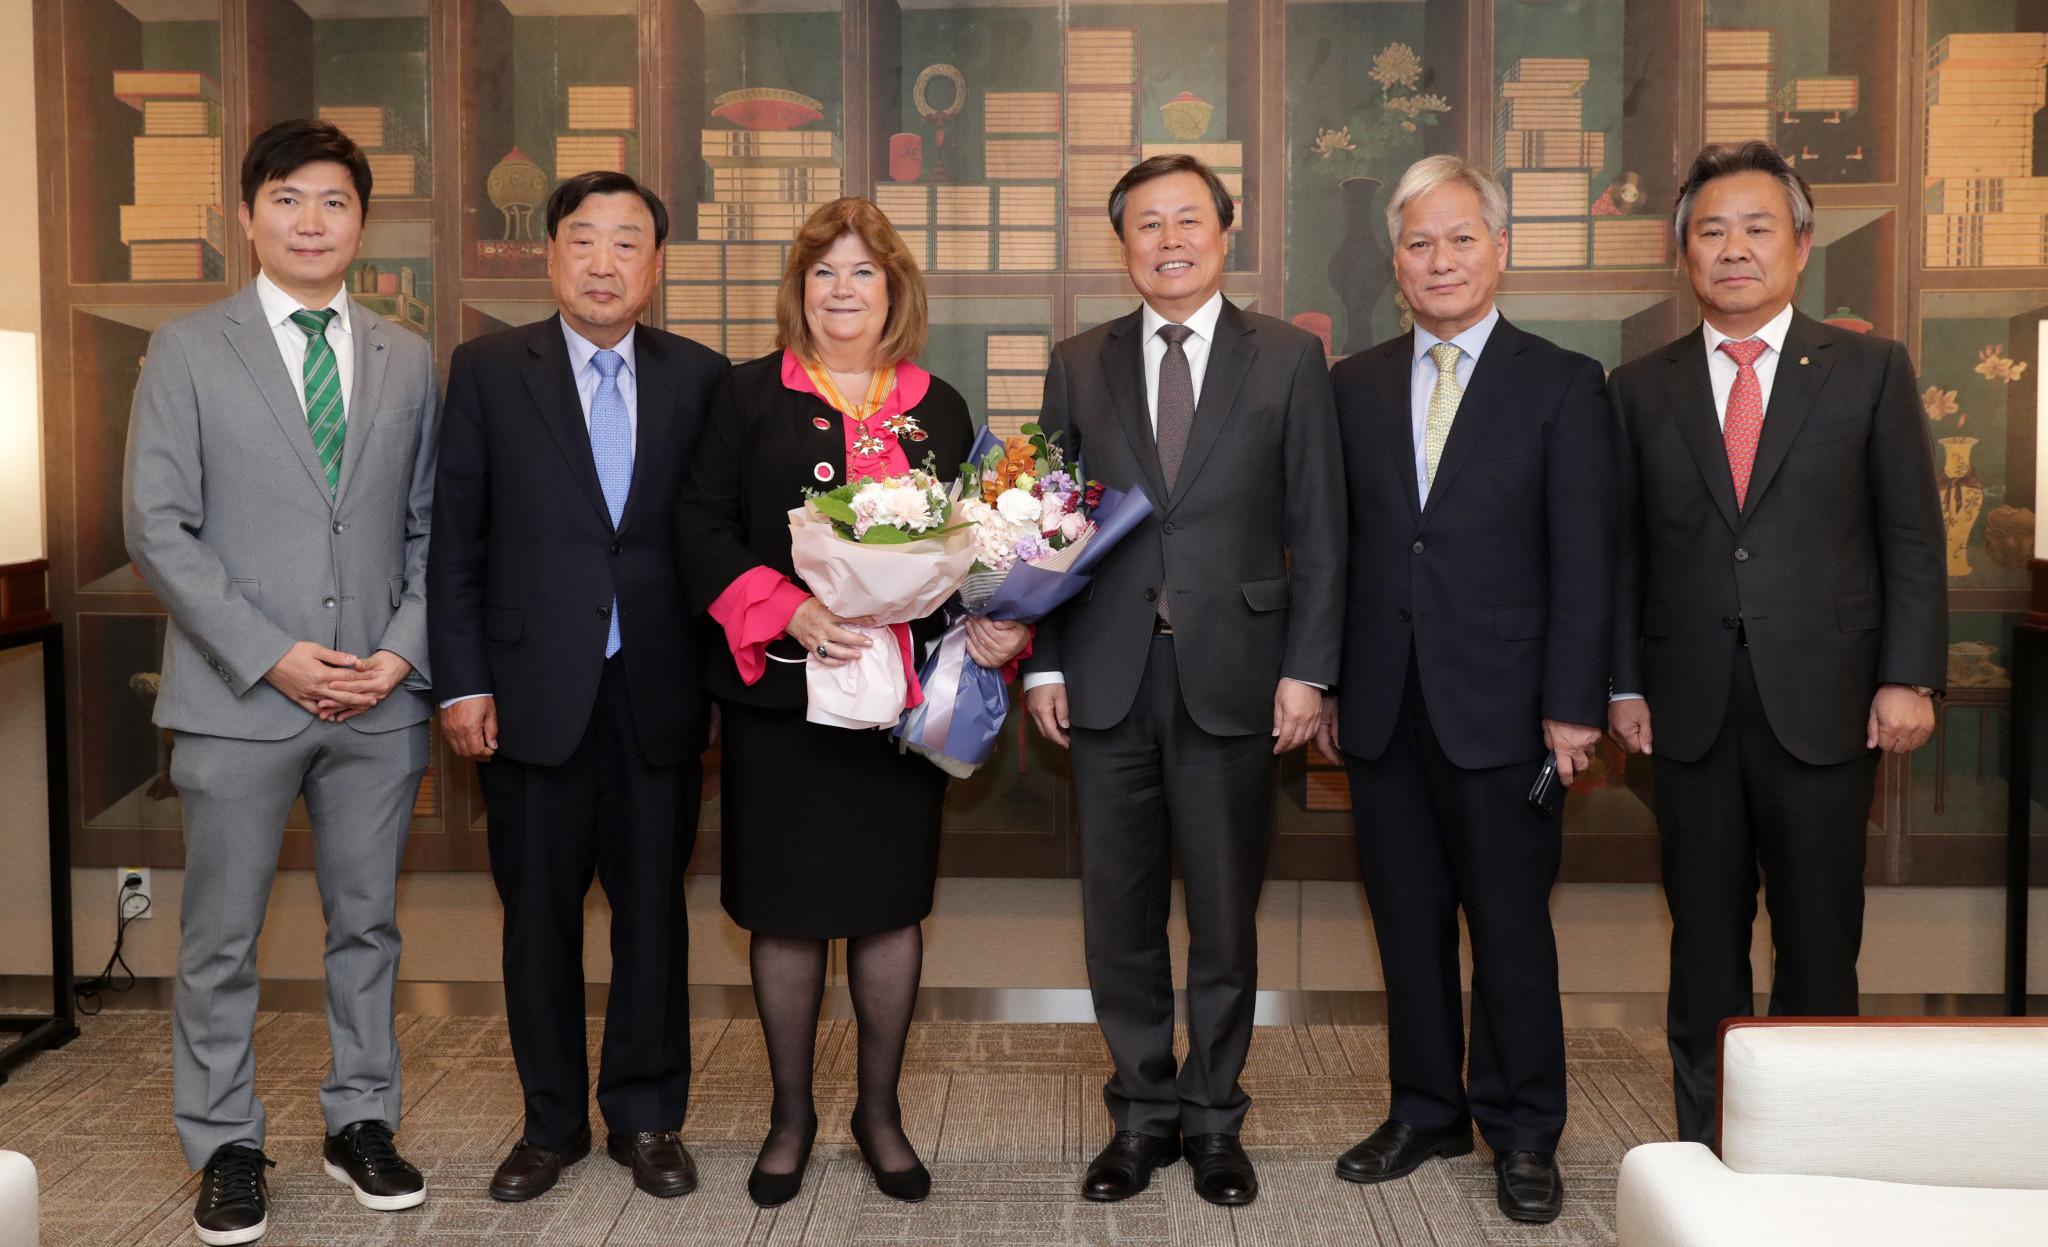 Lindberg receives prestigious award in recognition of Pyeongchang 2018 work